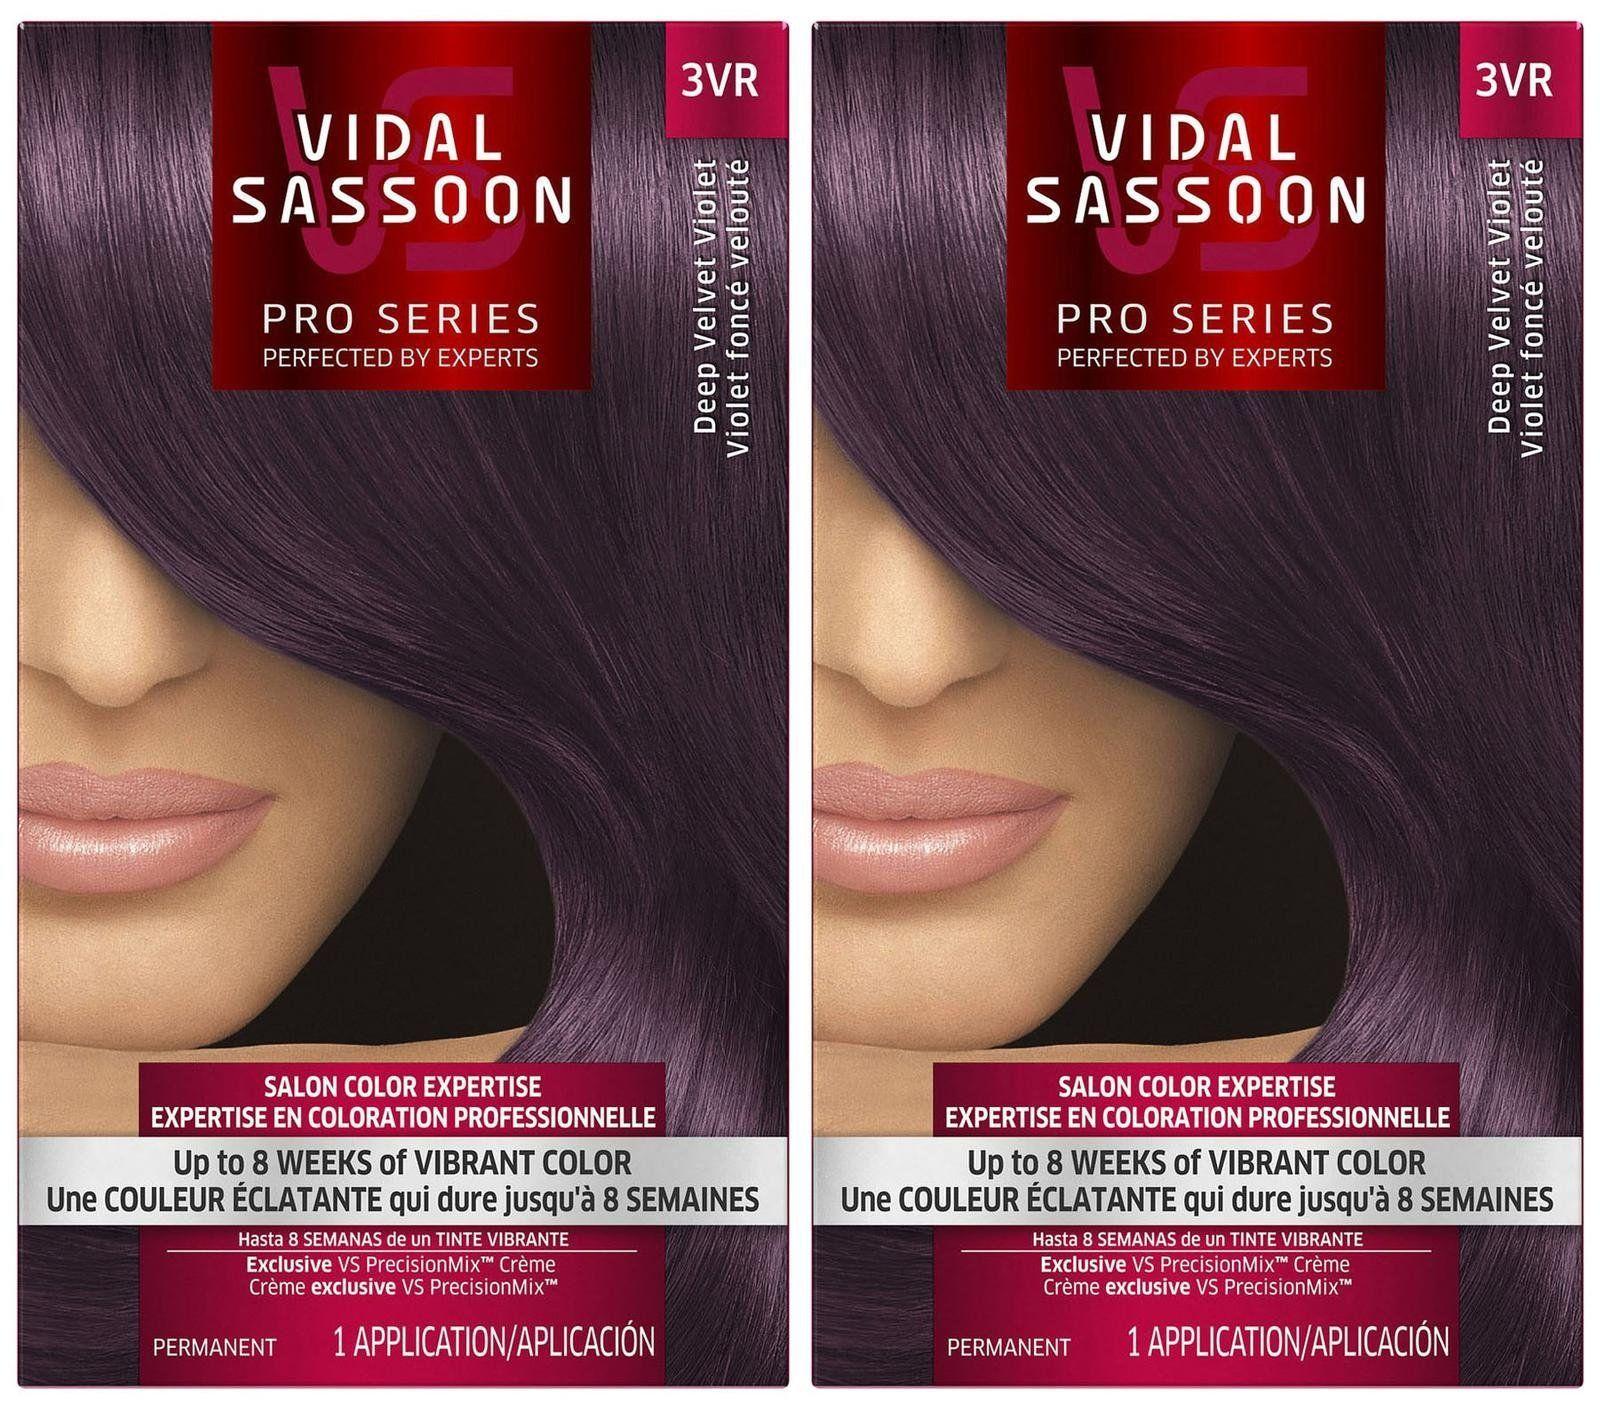 Vidal Sassoon Pro Series Hair Color Deep Velvet Violet 3vr 2